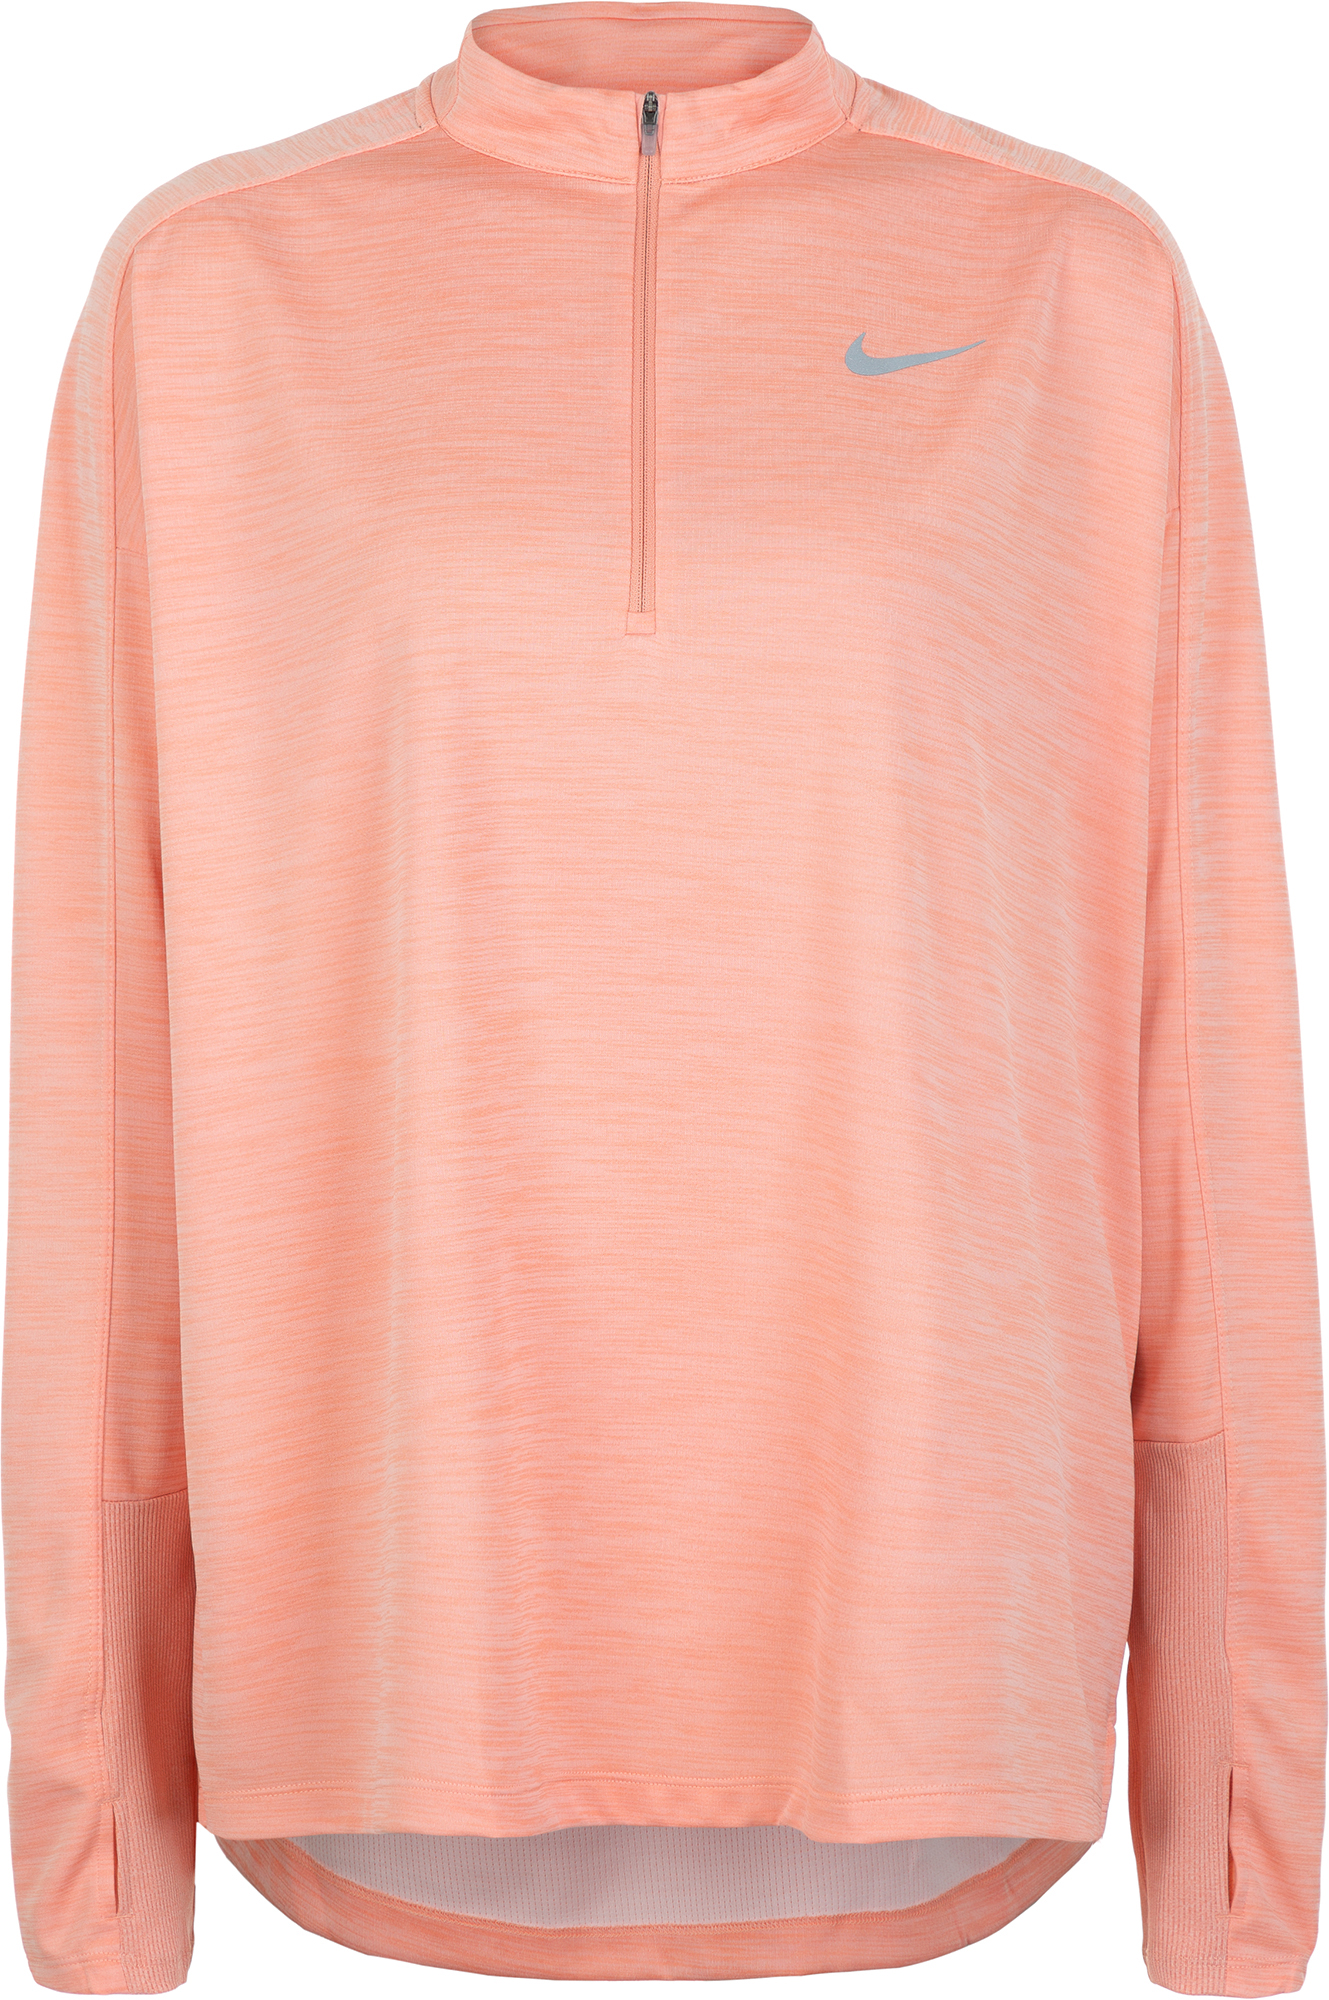 Nike Лонгслив женский Pacer, размер 56-58